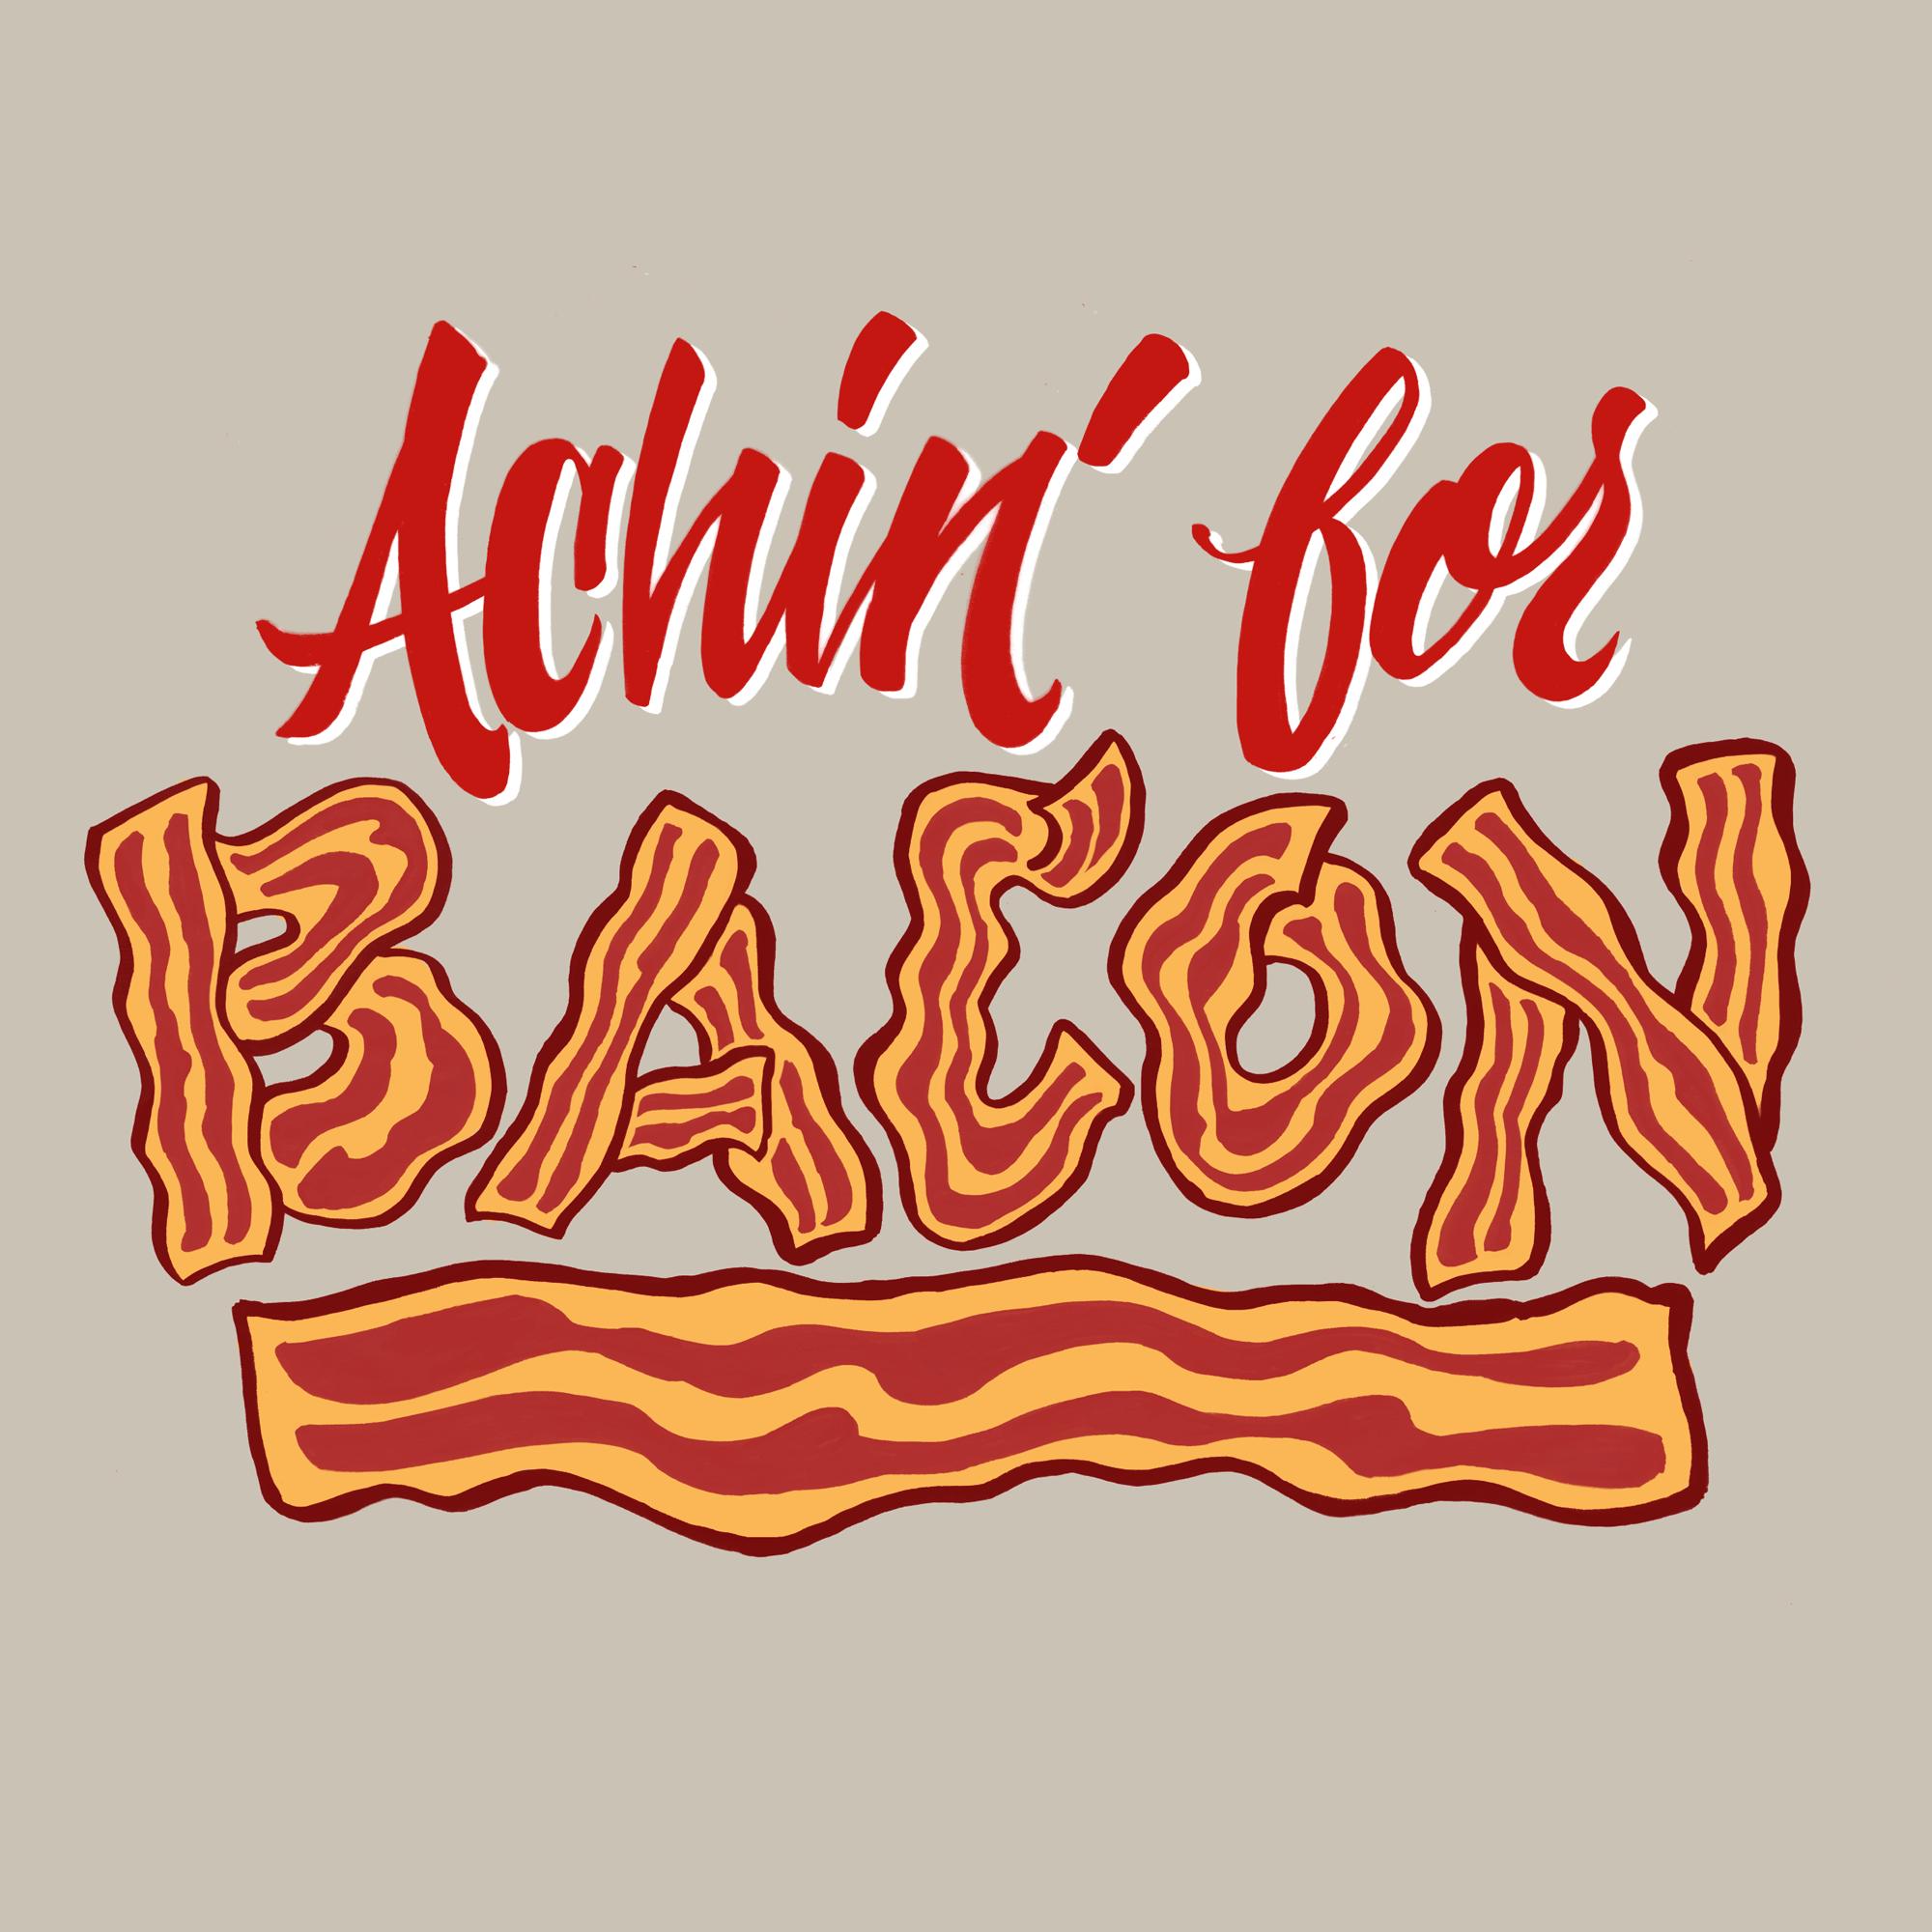 achin for bacon